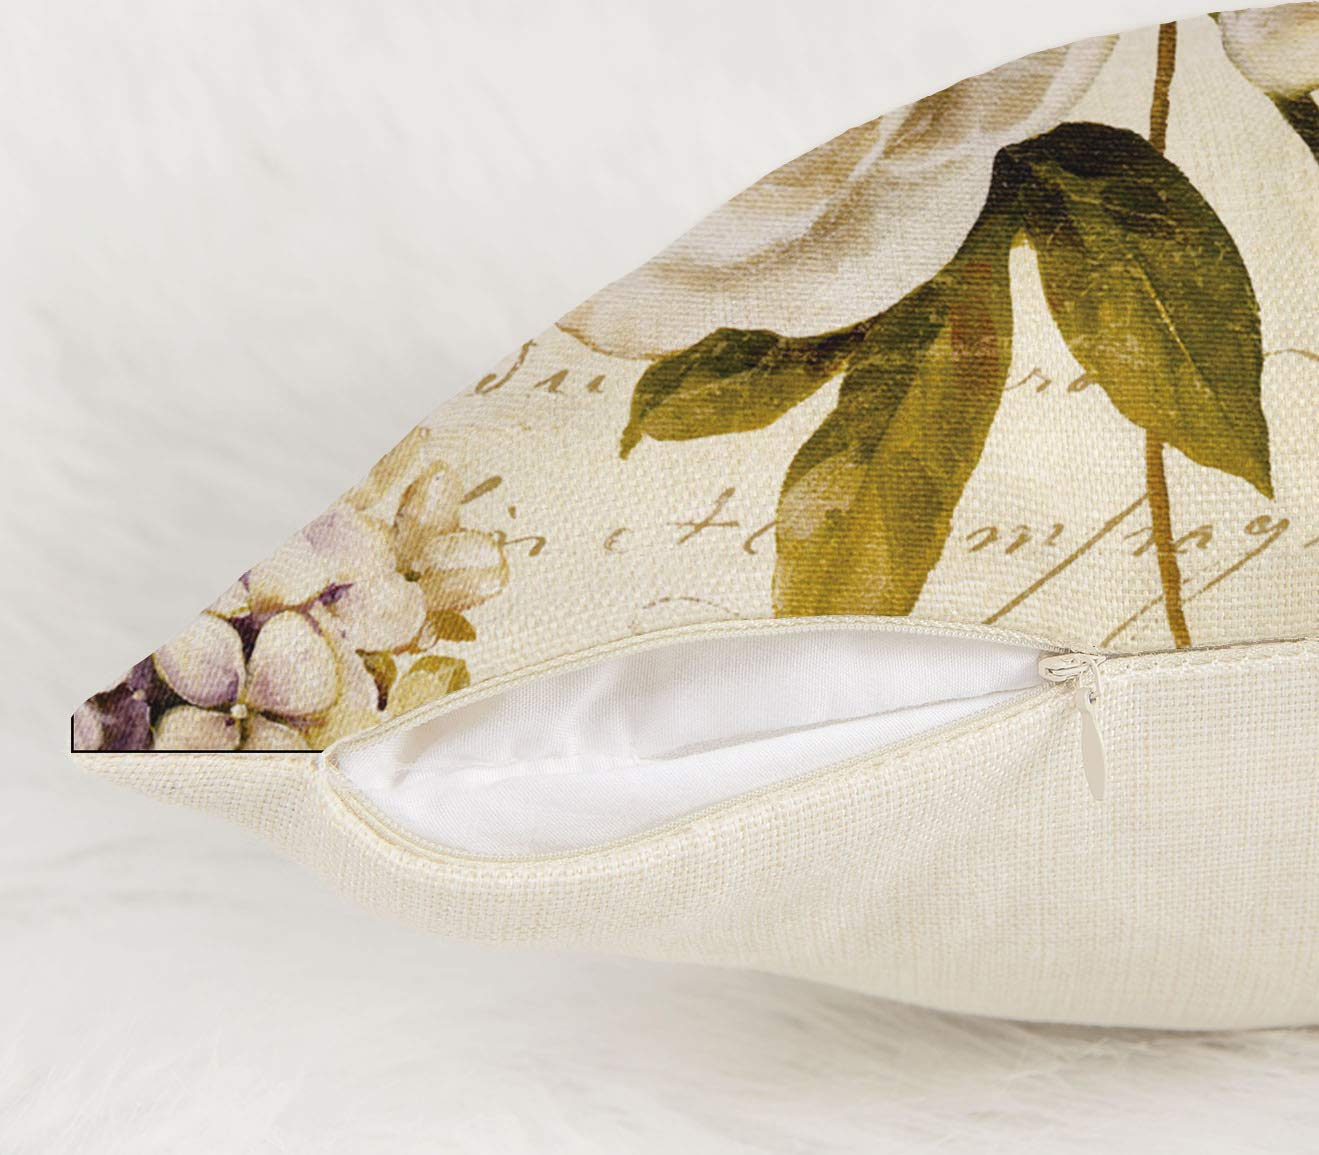 4TH Emotion Marche de Fleurs III by Lisa Audit Vintage Flower Butterfly Home Decor Design Throw Pillow Cover Pillow Case 18 x 18 Inch Cotton Linen for Sofa